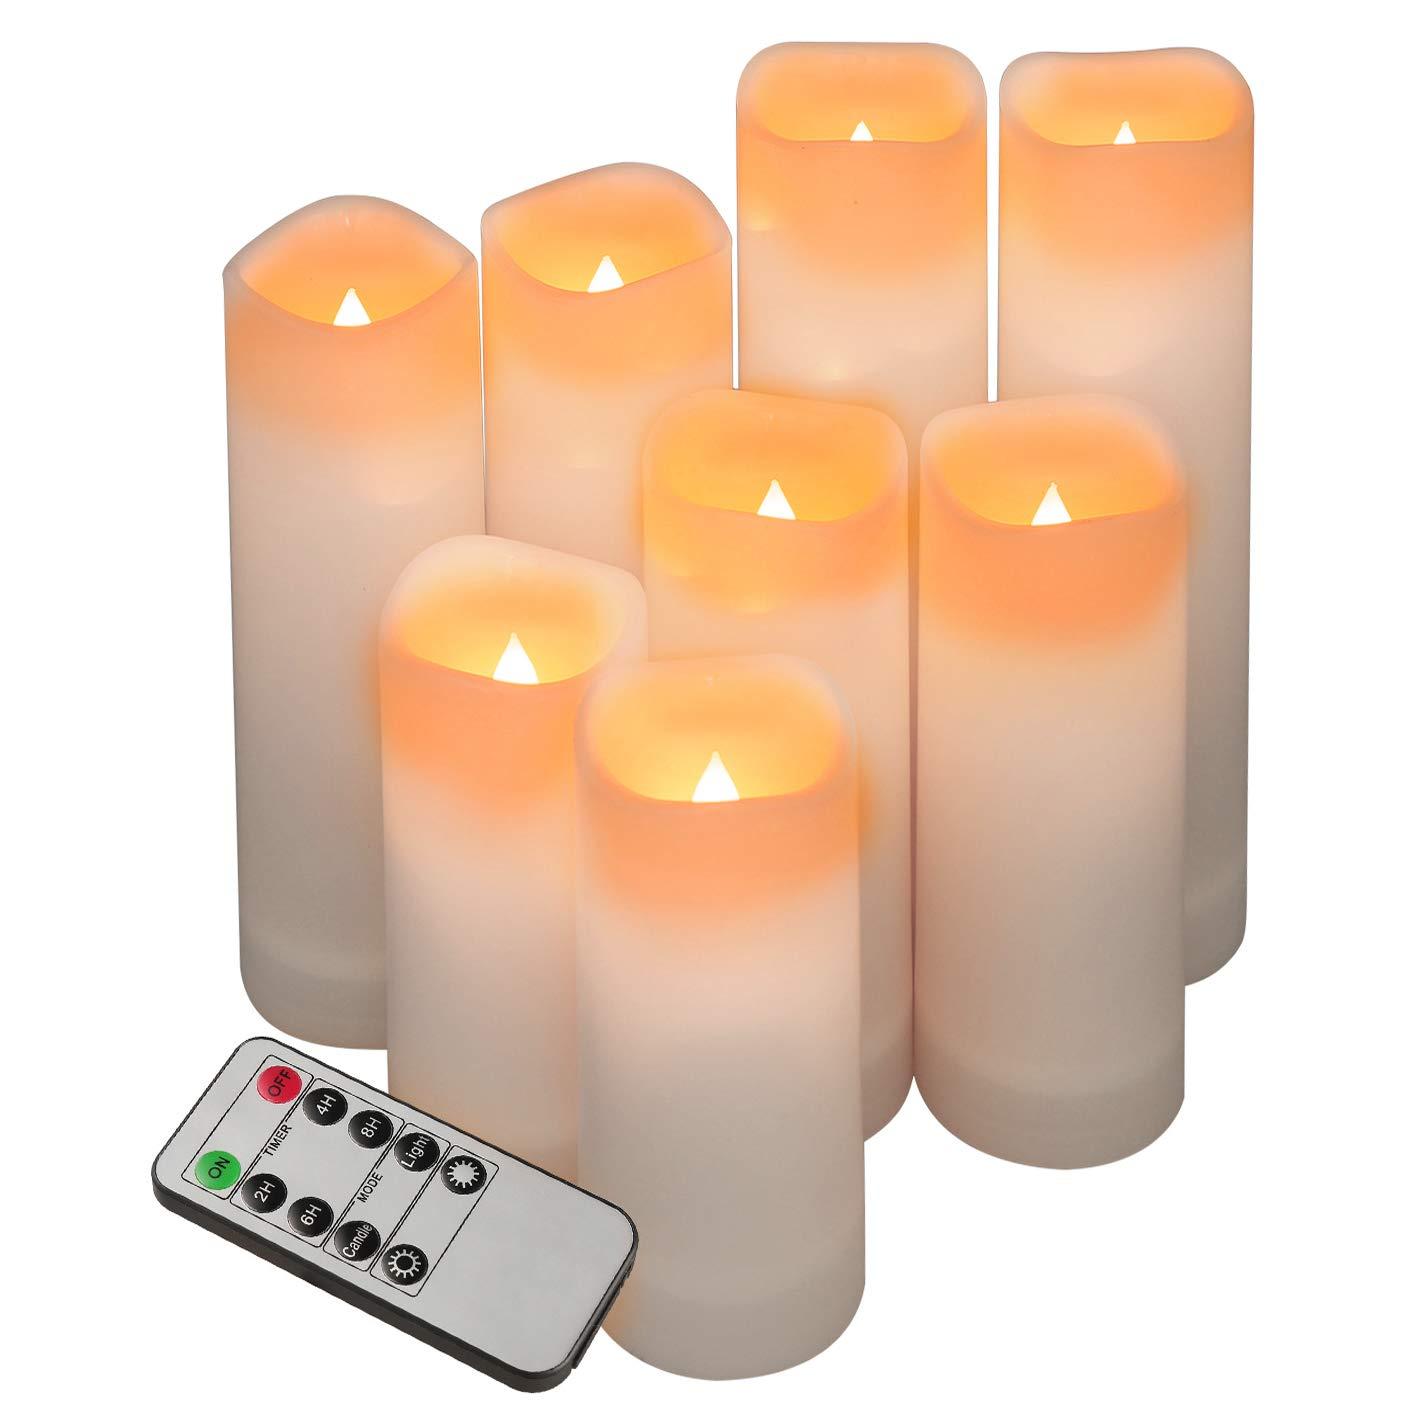 Flameless Candles Waterproof Outdoor Set Of 9 D 2.2/'/' X H 5/'/'5/'/'6/'/'6/'/'6/'/'7/'/'7/'/'7